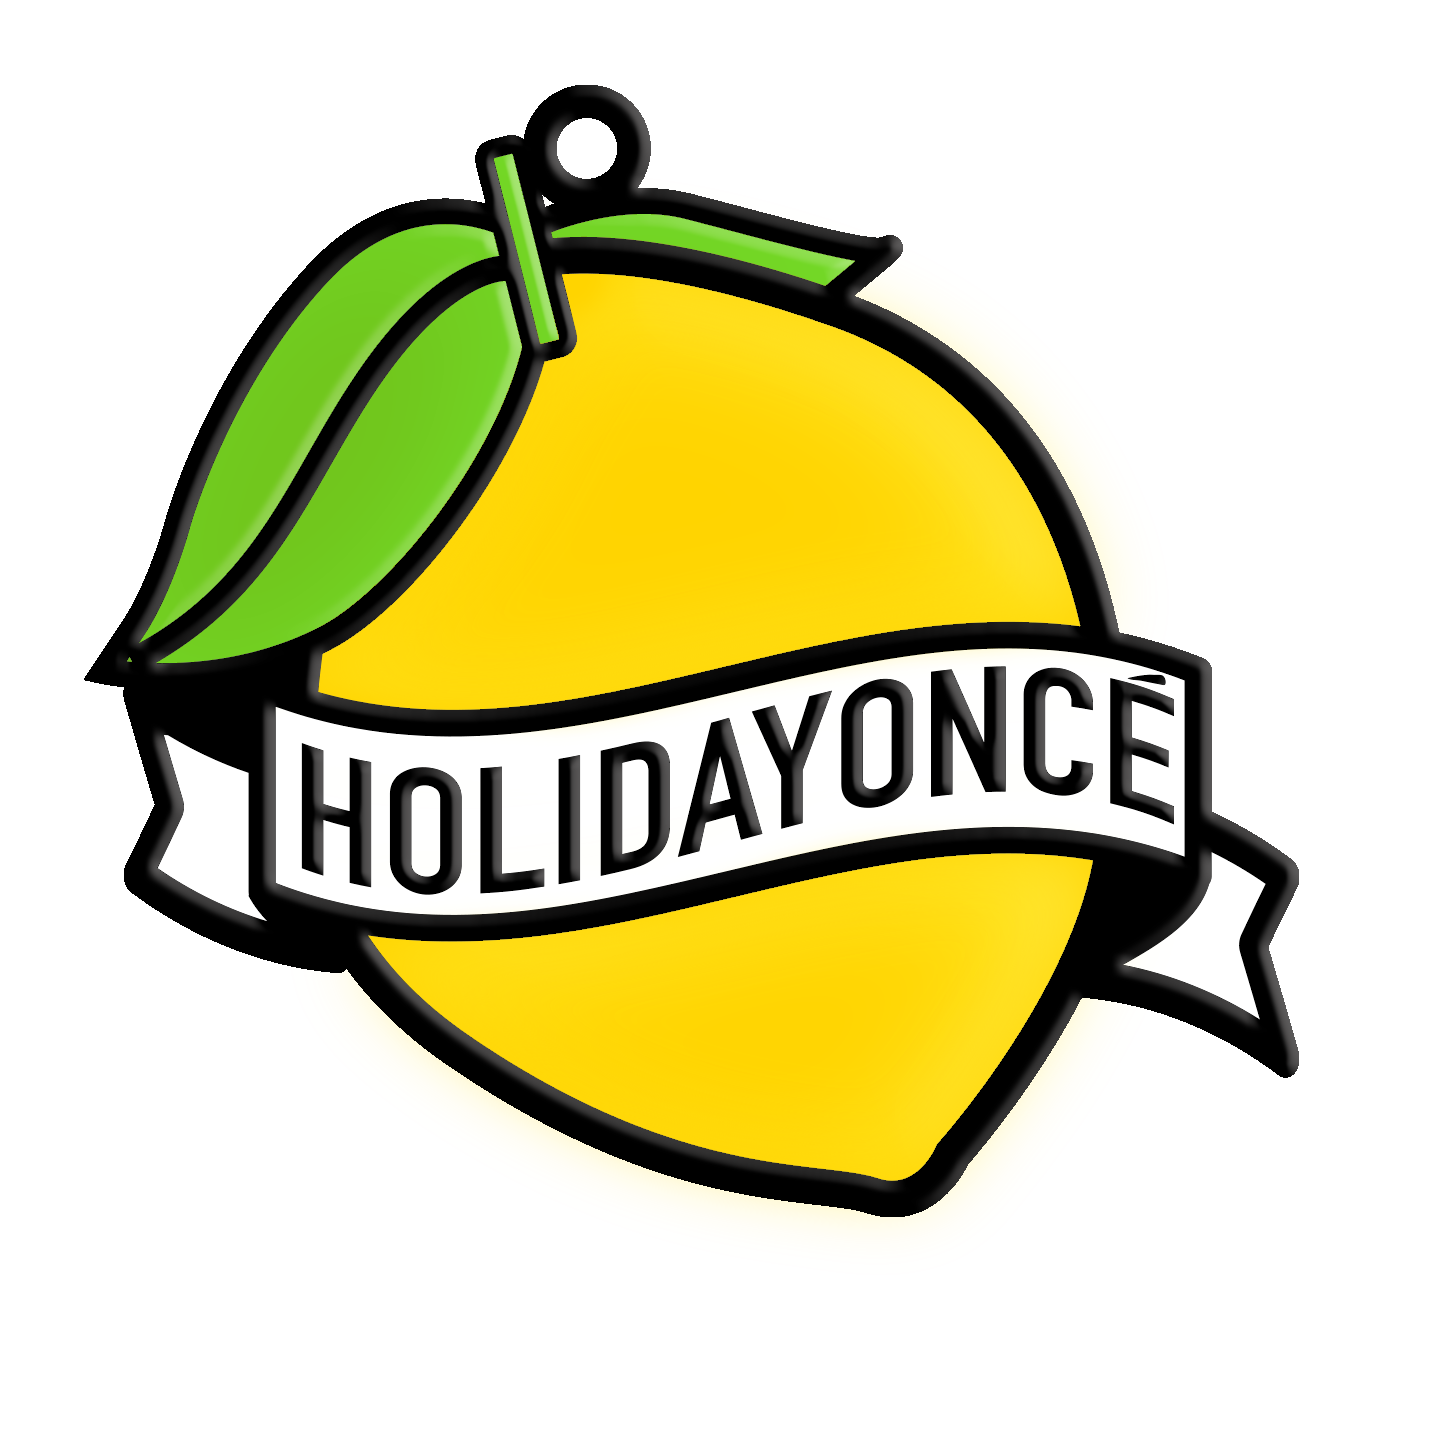 Ornament_Holidayonce_EnamelLemon.png